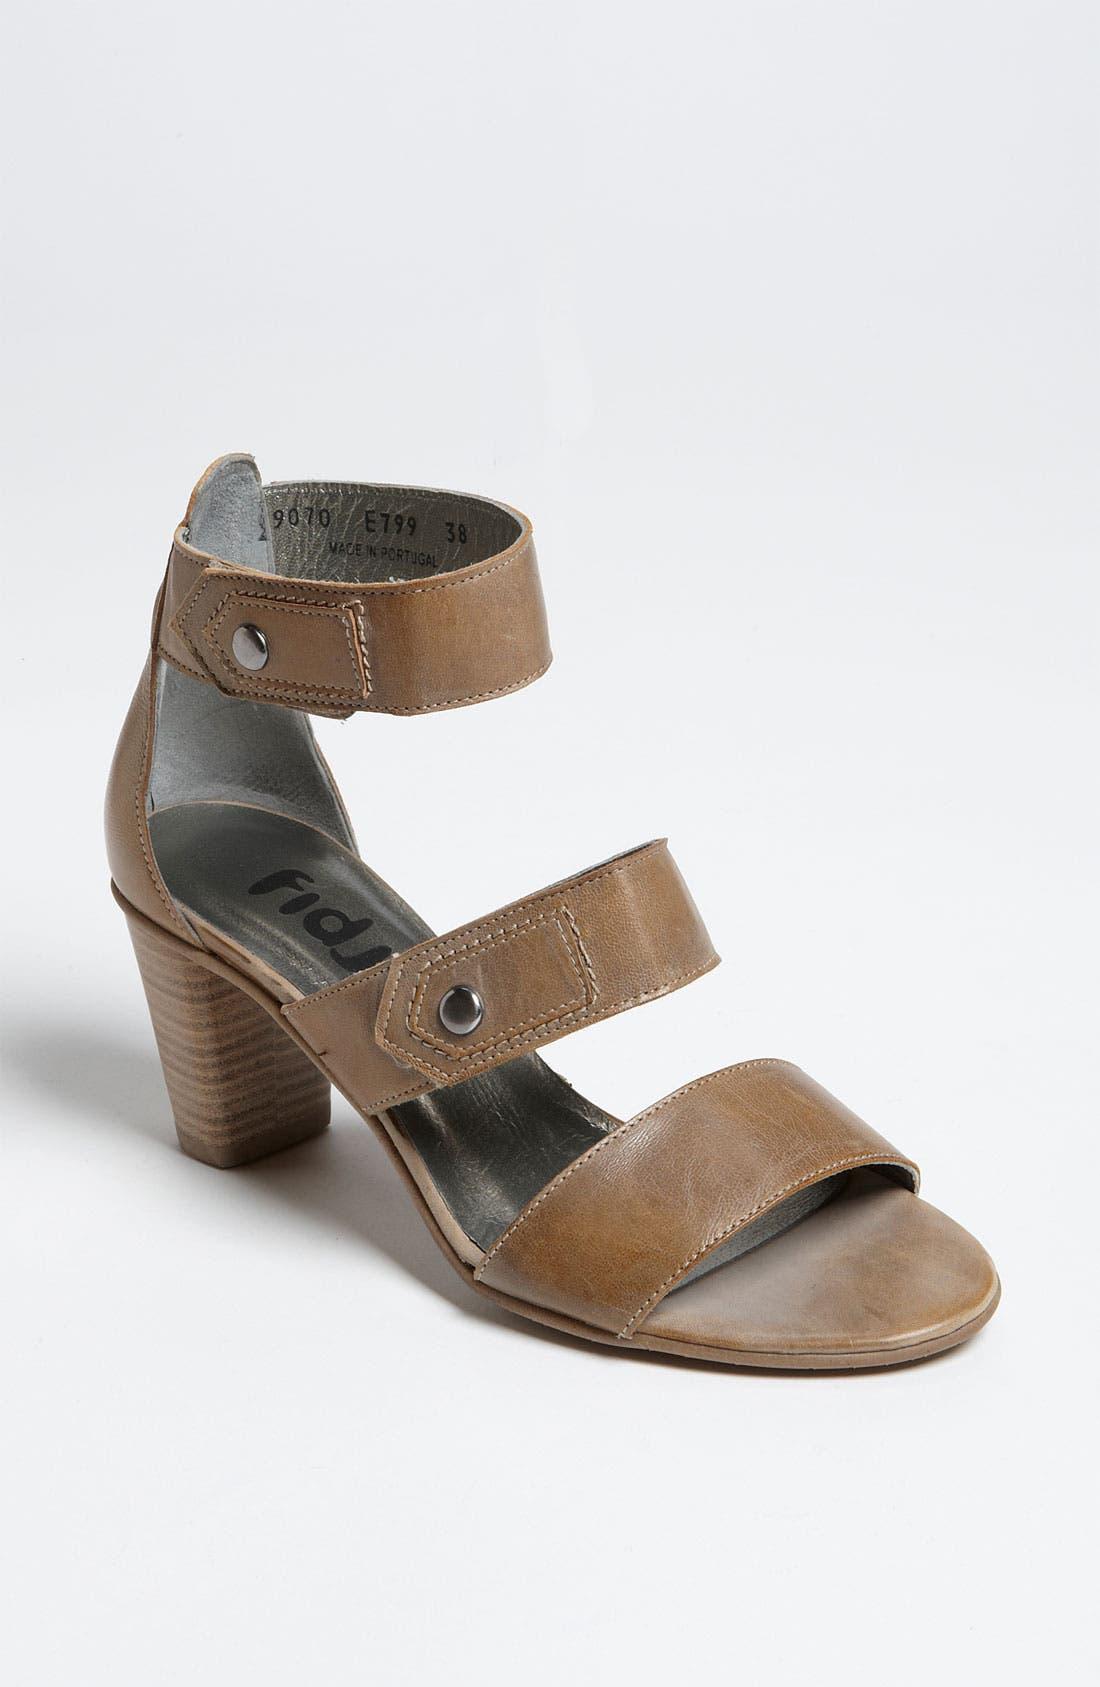 Alternate Image 1 Selected - Fidji 'E799' Sandal